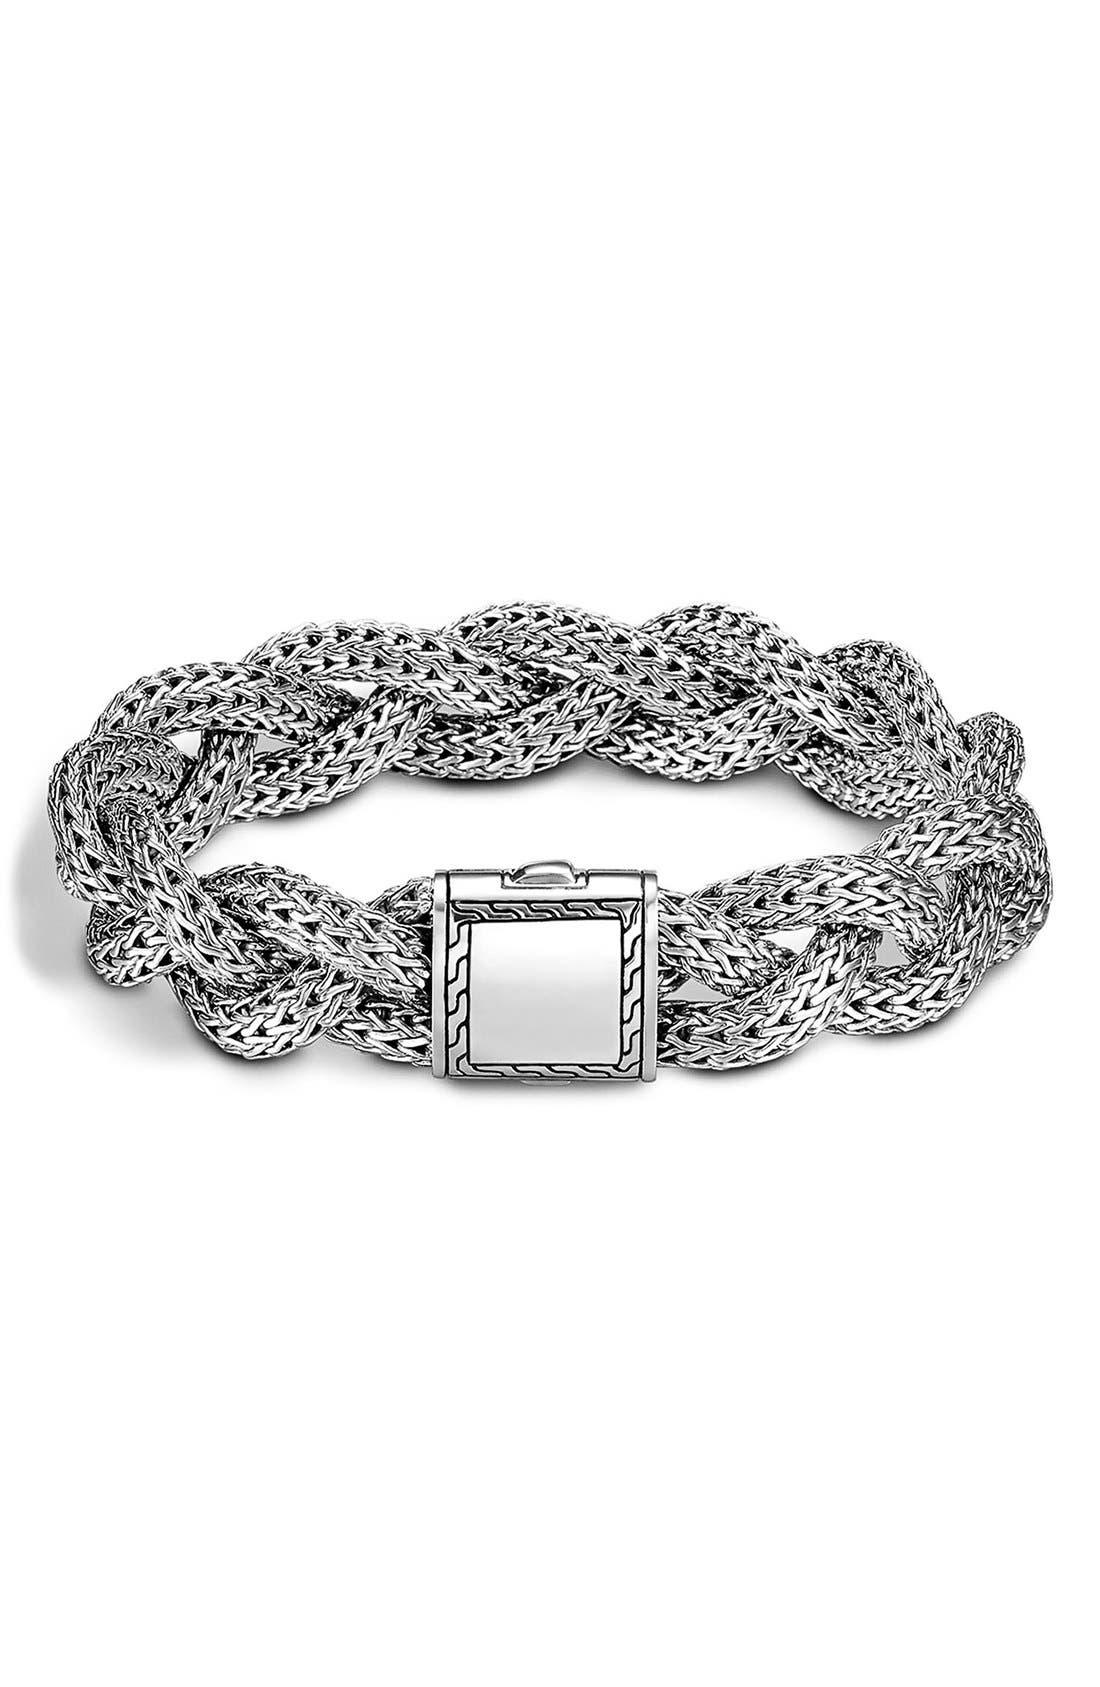 Main Image - John Hardy 'Classic Chain' Medium Braided Bracelet